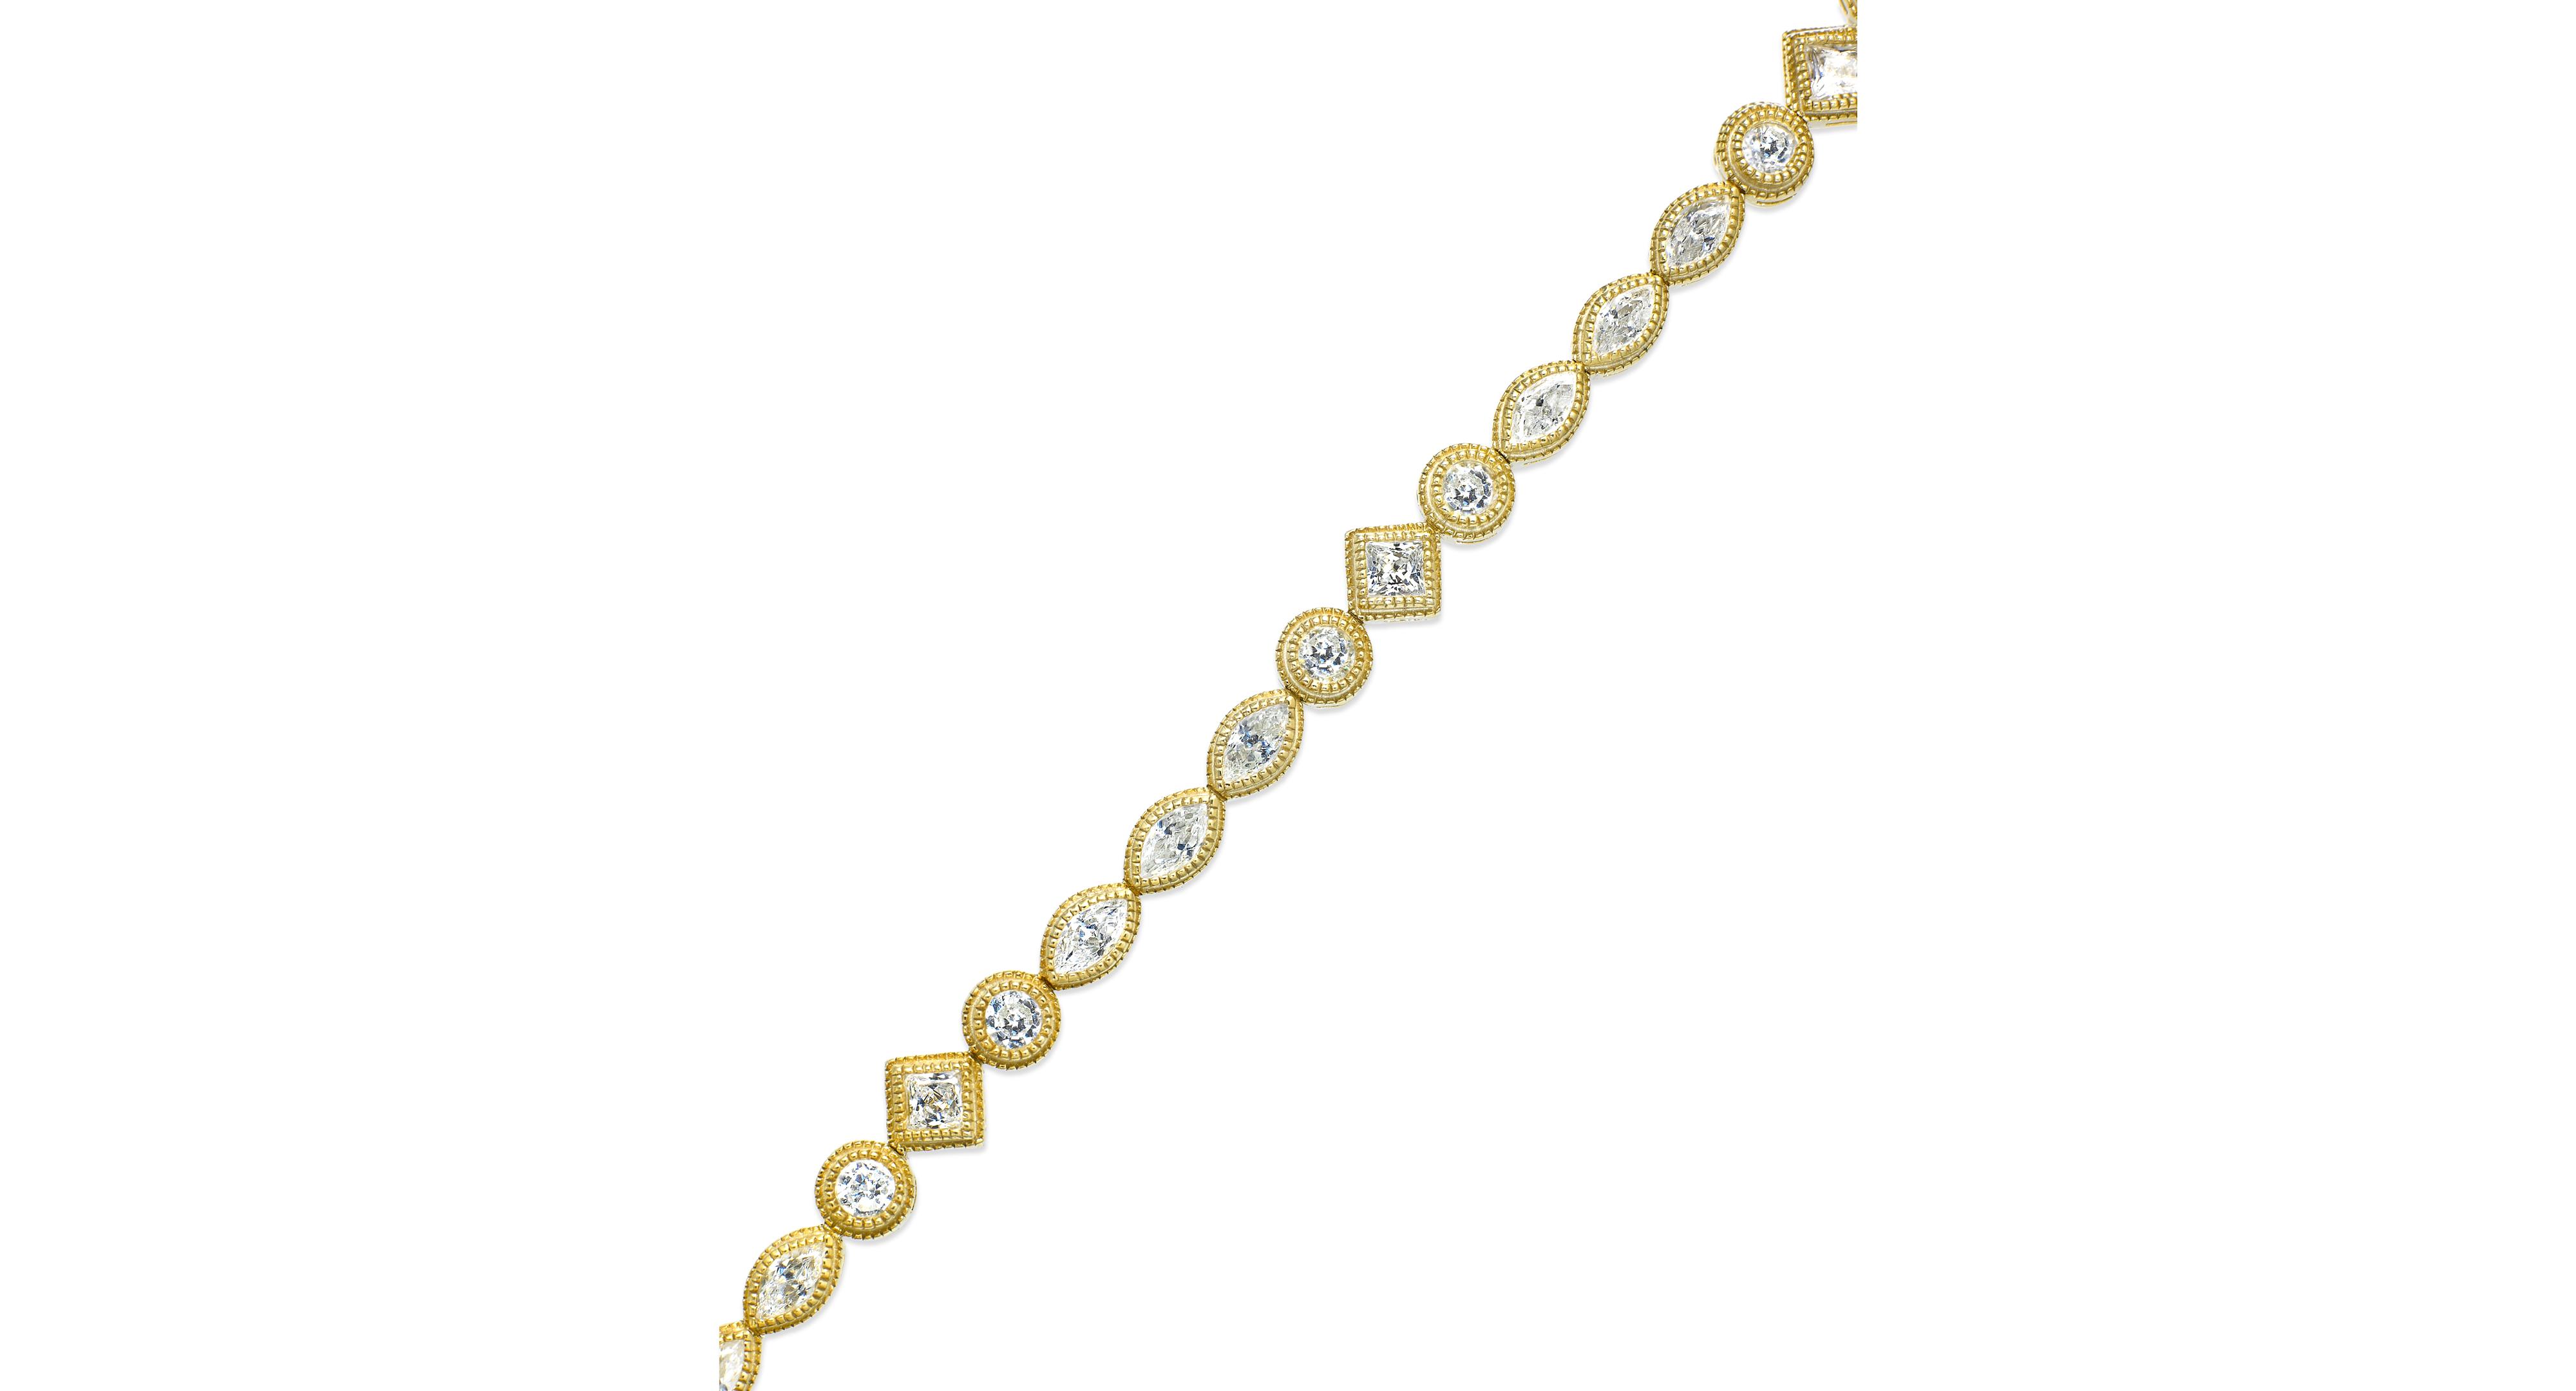 B. Brilliant Cubic Zirconia Multi-Shape Bracelet in 18k Gold over Sterling Silver (4 ct. t.w.)